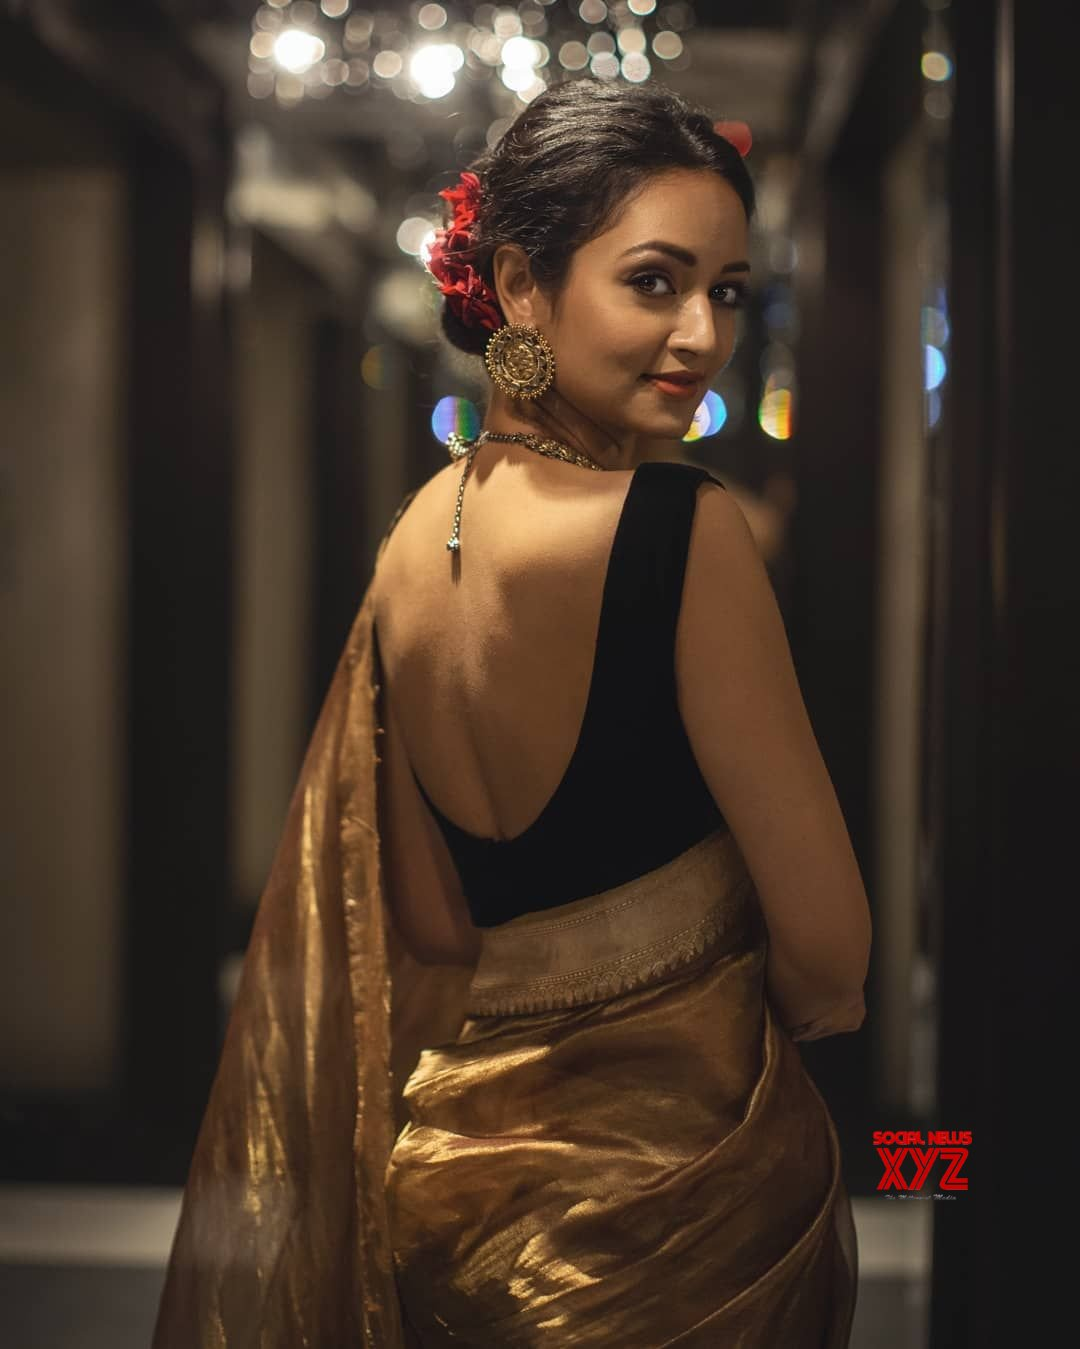 Actress Shanvi Srivastava Elegant Stills In This Beautiful Saree Social News Xyz